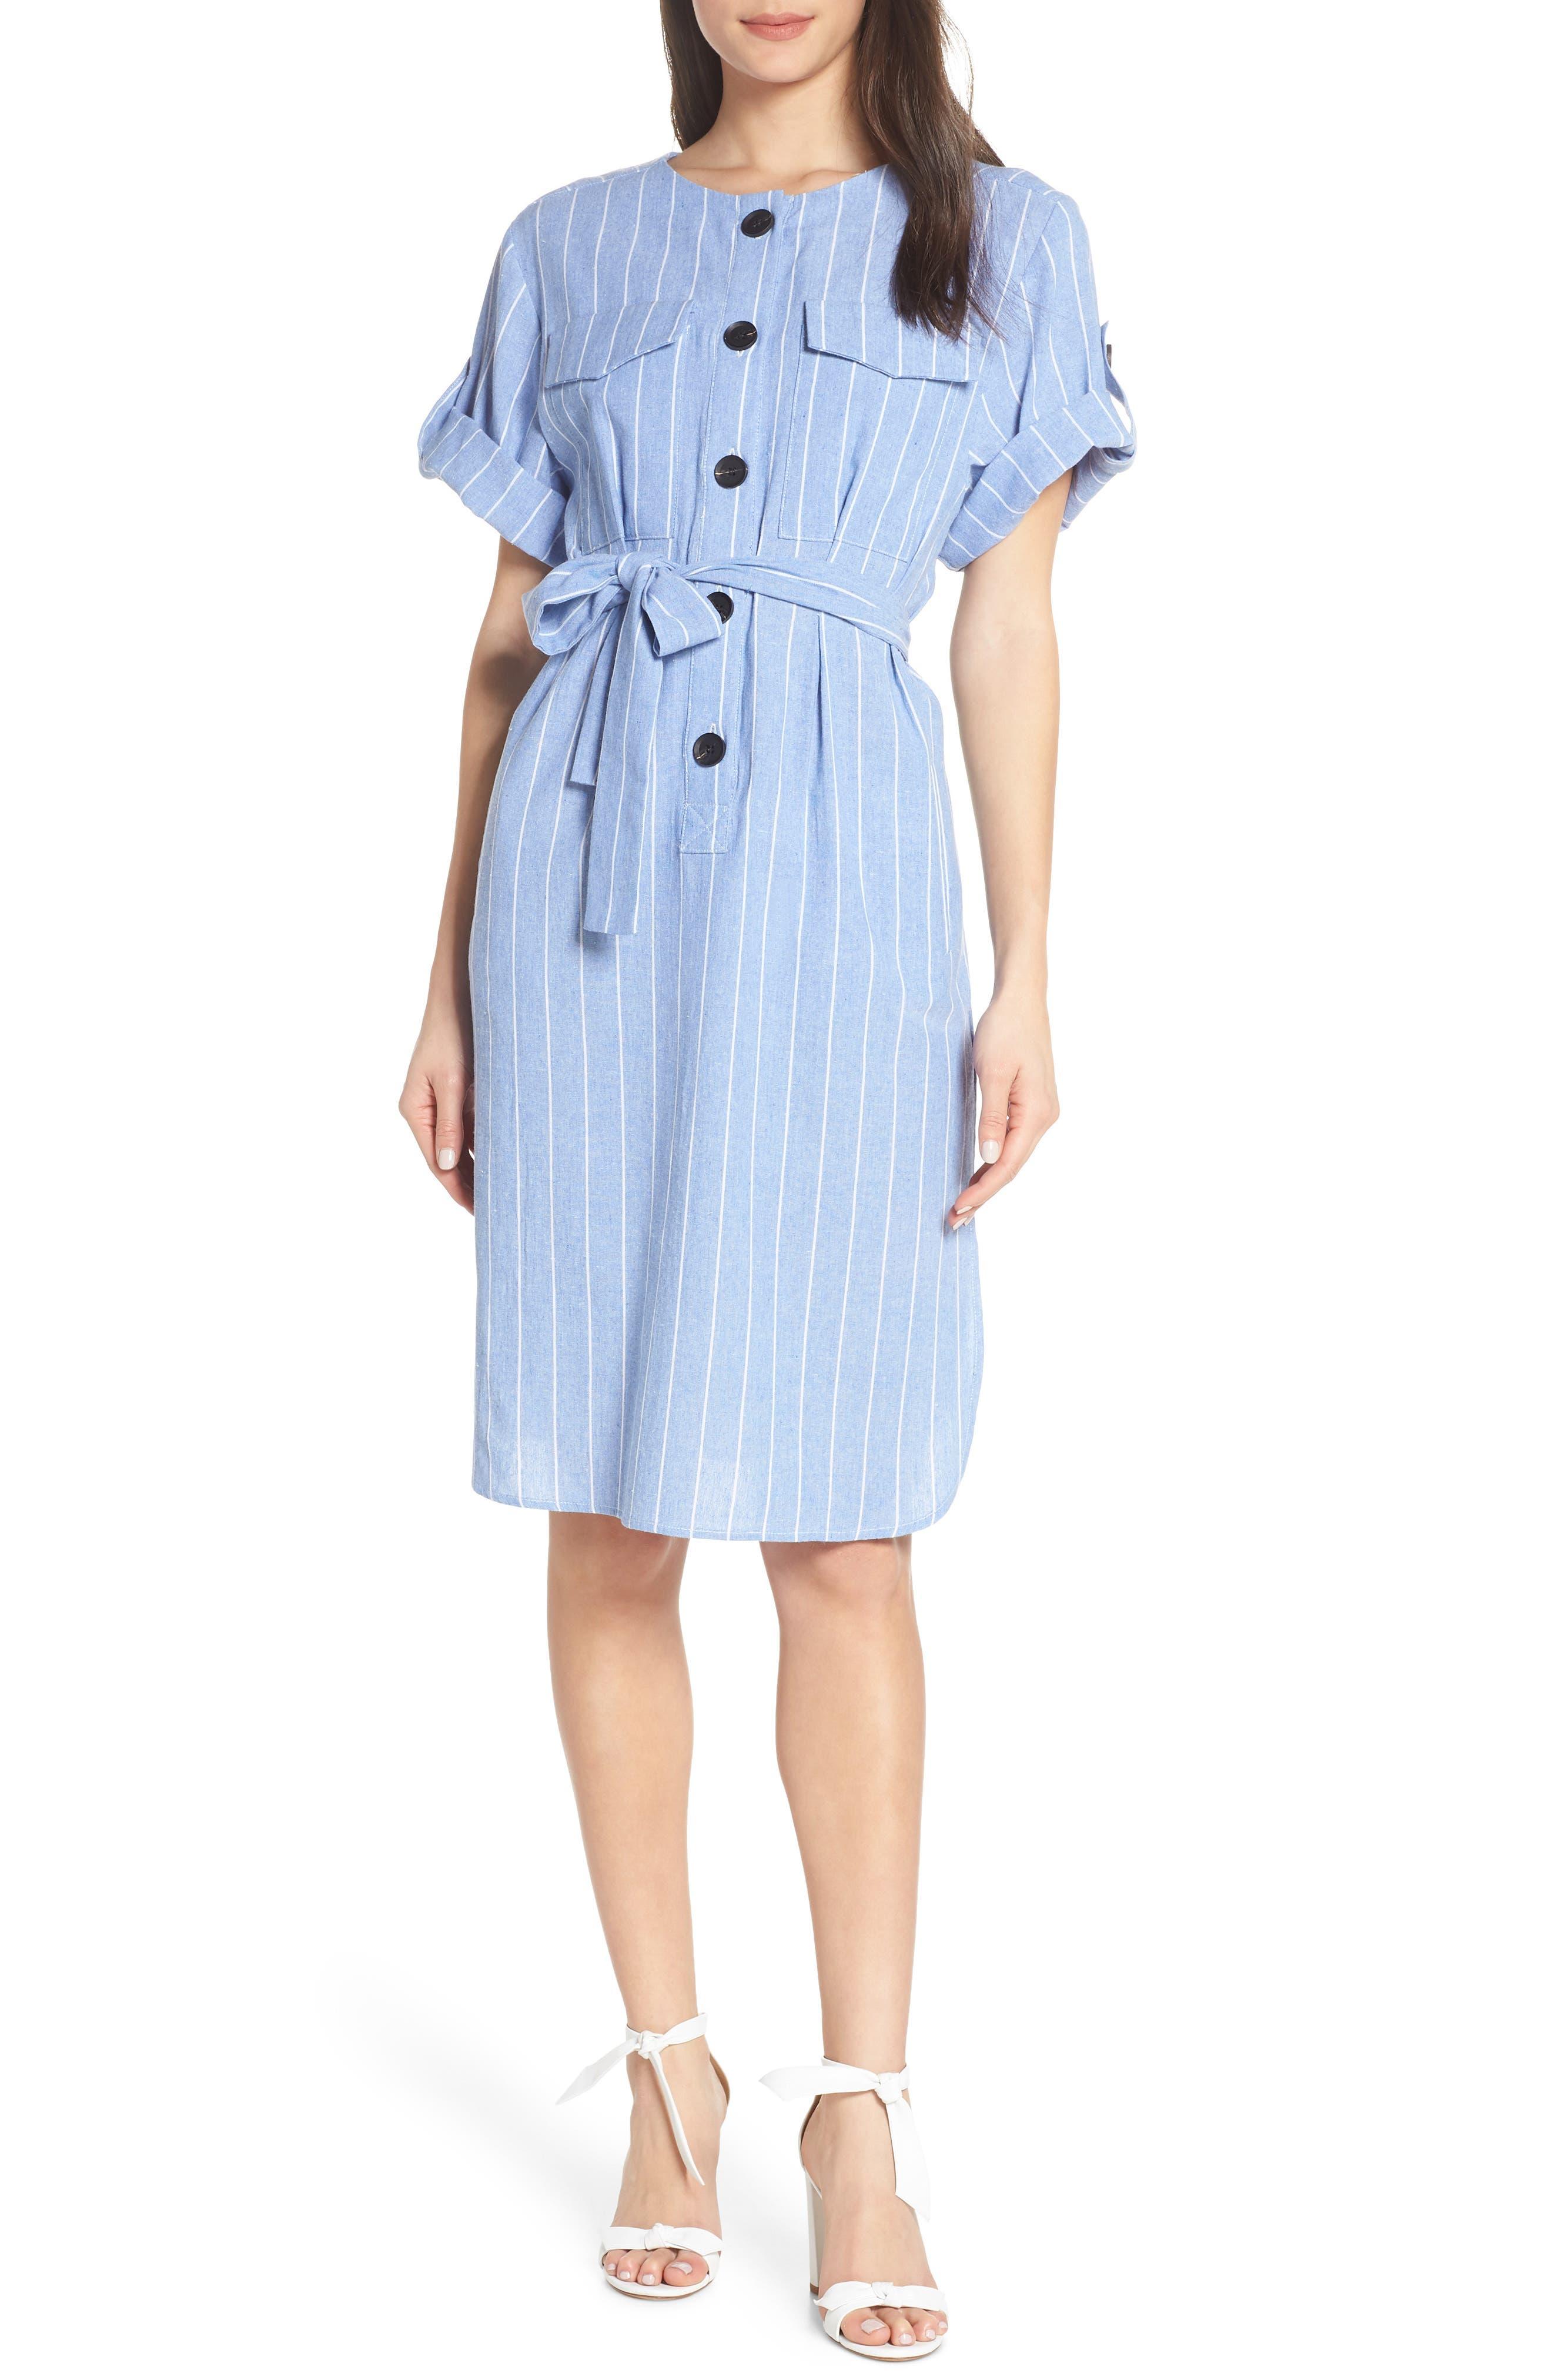 Caara Fay Stripe Button Front Dress, Blue